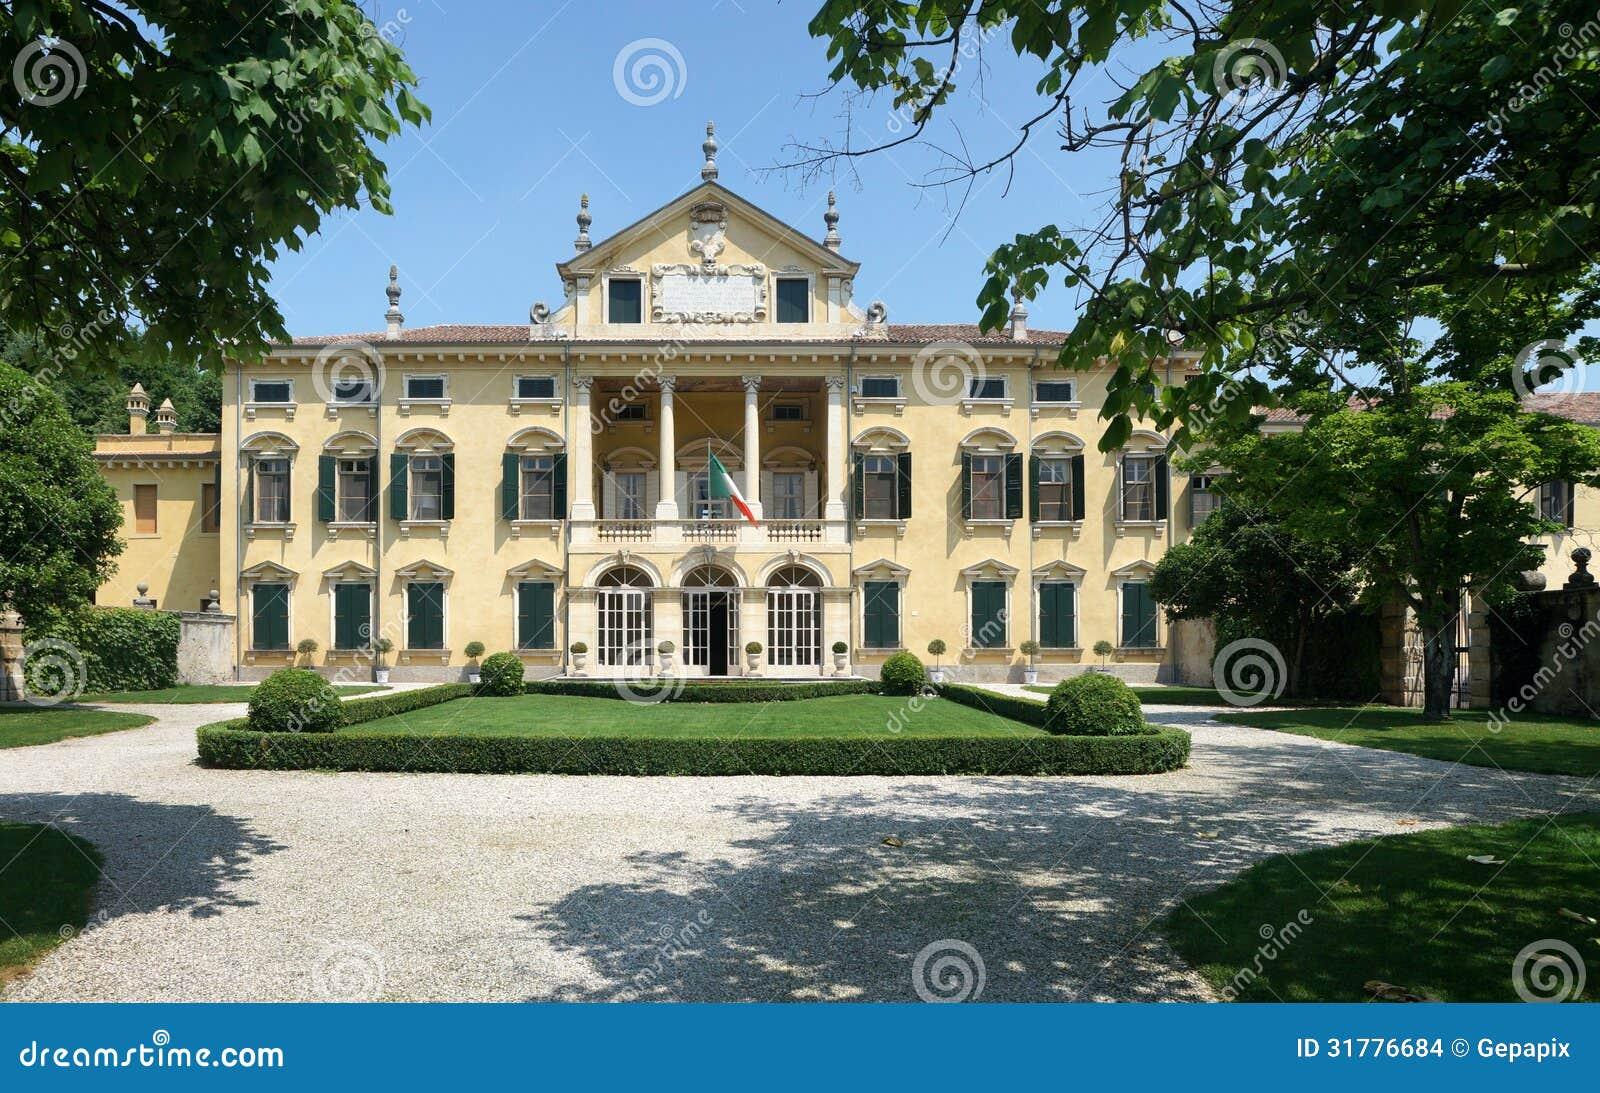 Italian Mansion stock photo. Image of italy, villa, mansion - 31776684 for Italian Villa Mansion  45ifm